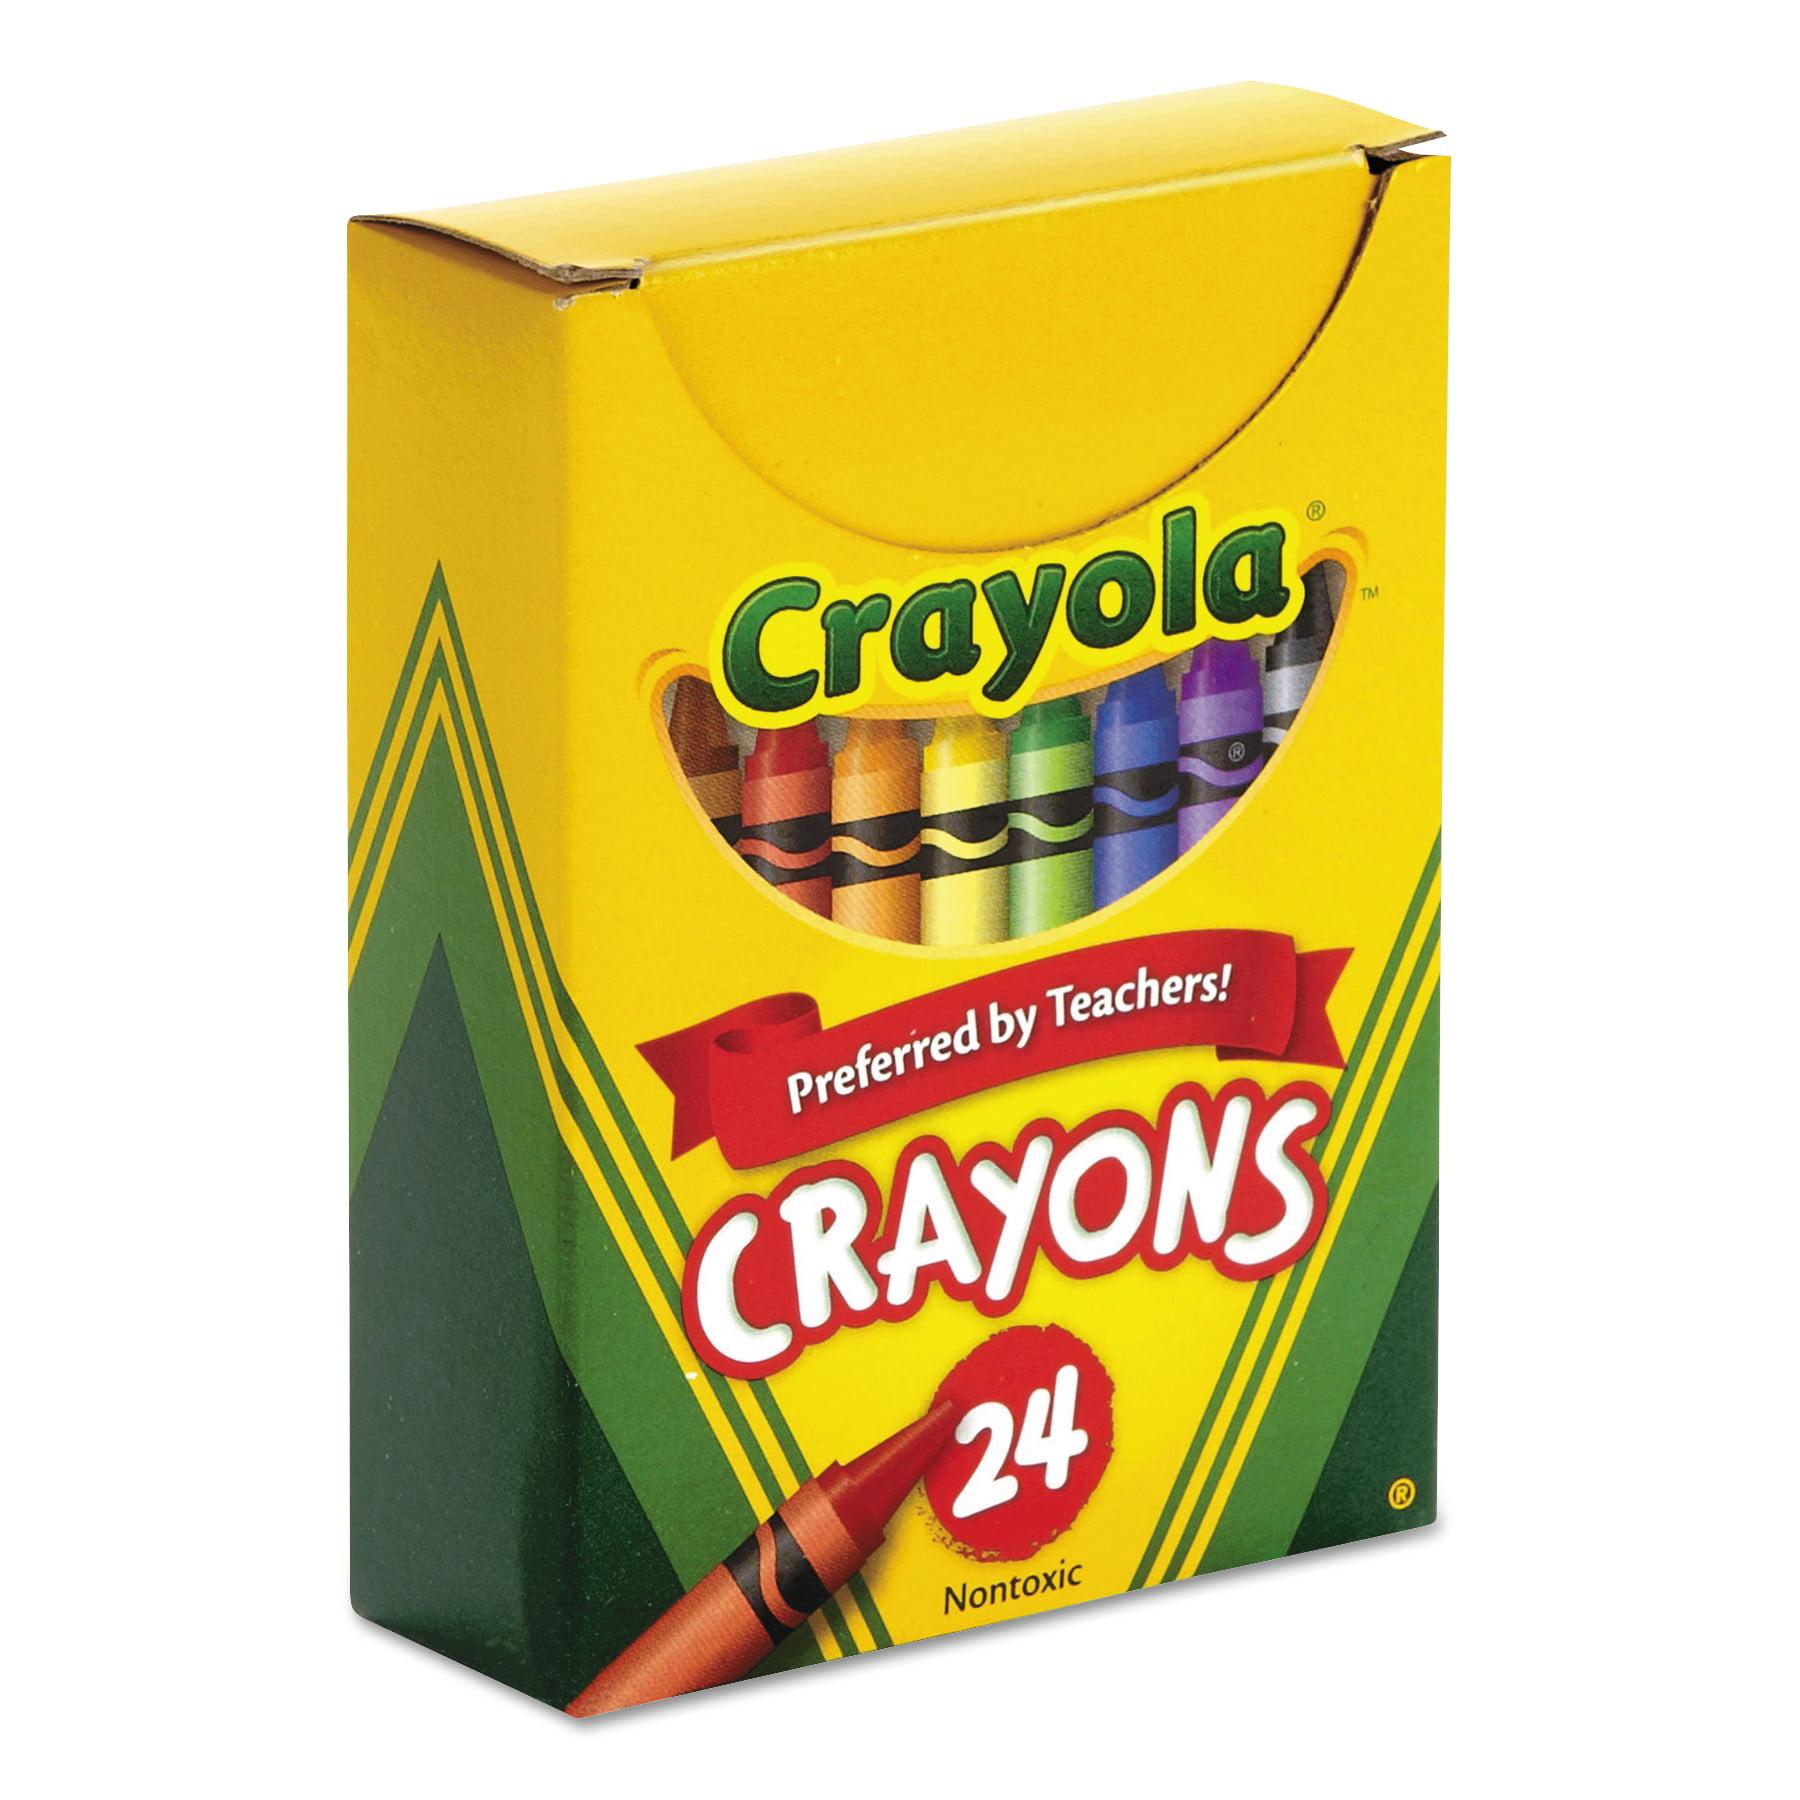 crayola classic color crayons tuck box 24 colors cyo520024